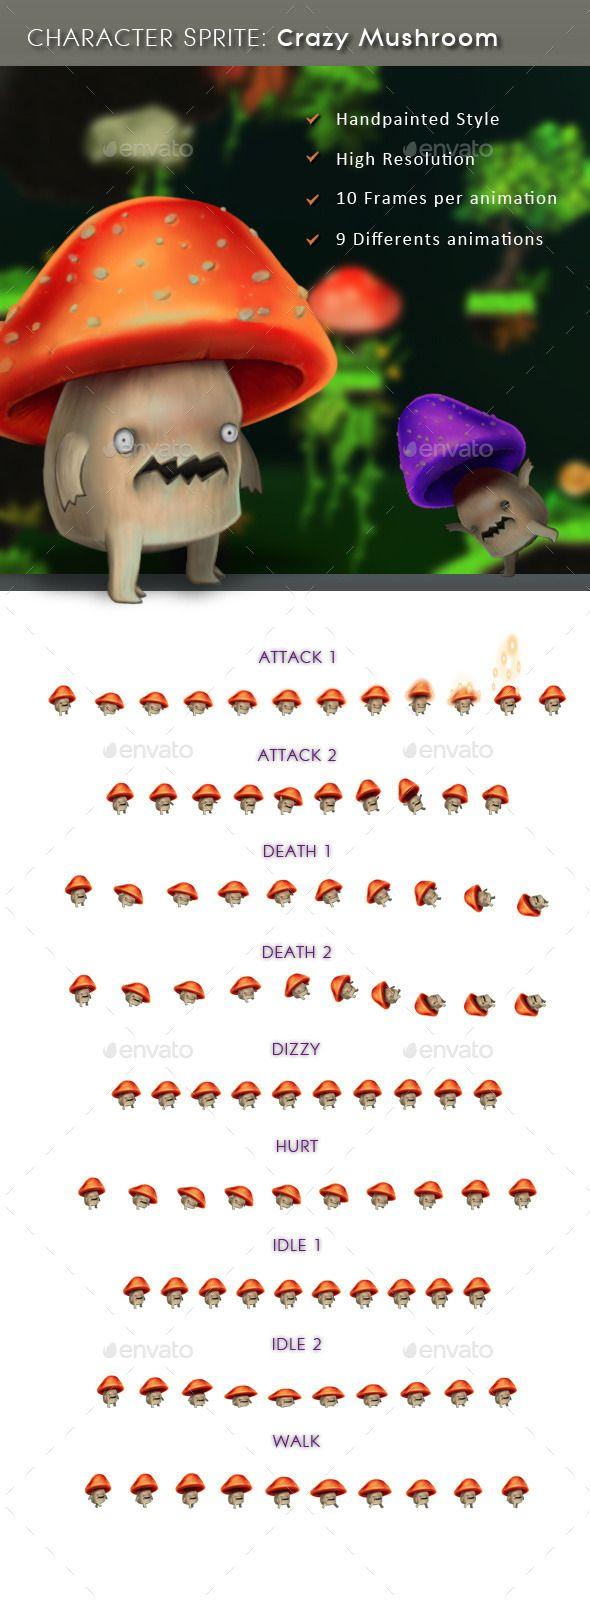 #Character Sprite: Crazy Mushroom - Sprites #Game #Assets Download here: https://graphicriver.net/item/character-sprite-crazy-mushroom/11427121?ref=alena994